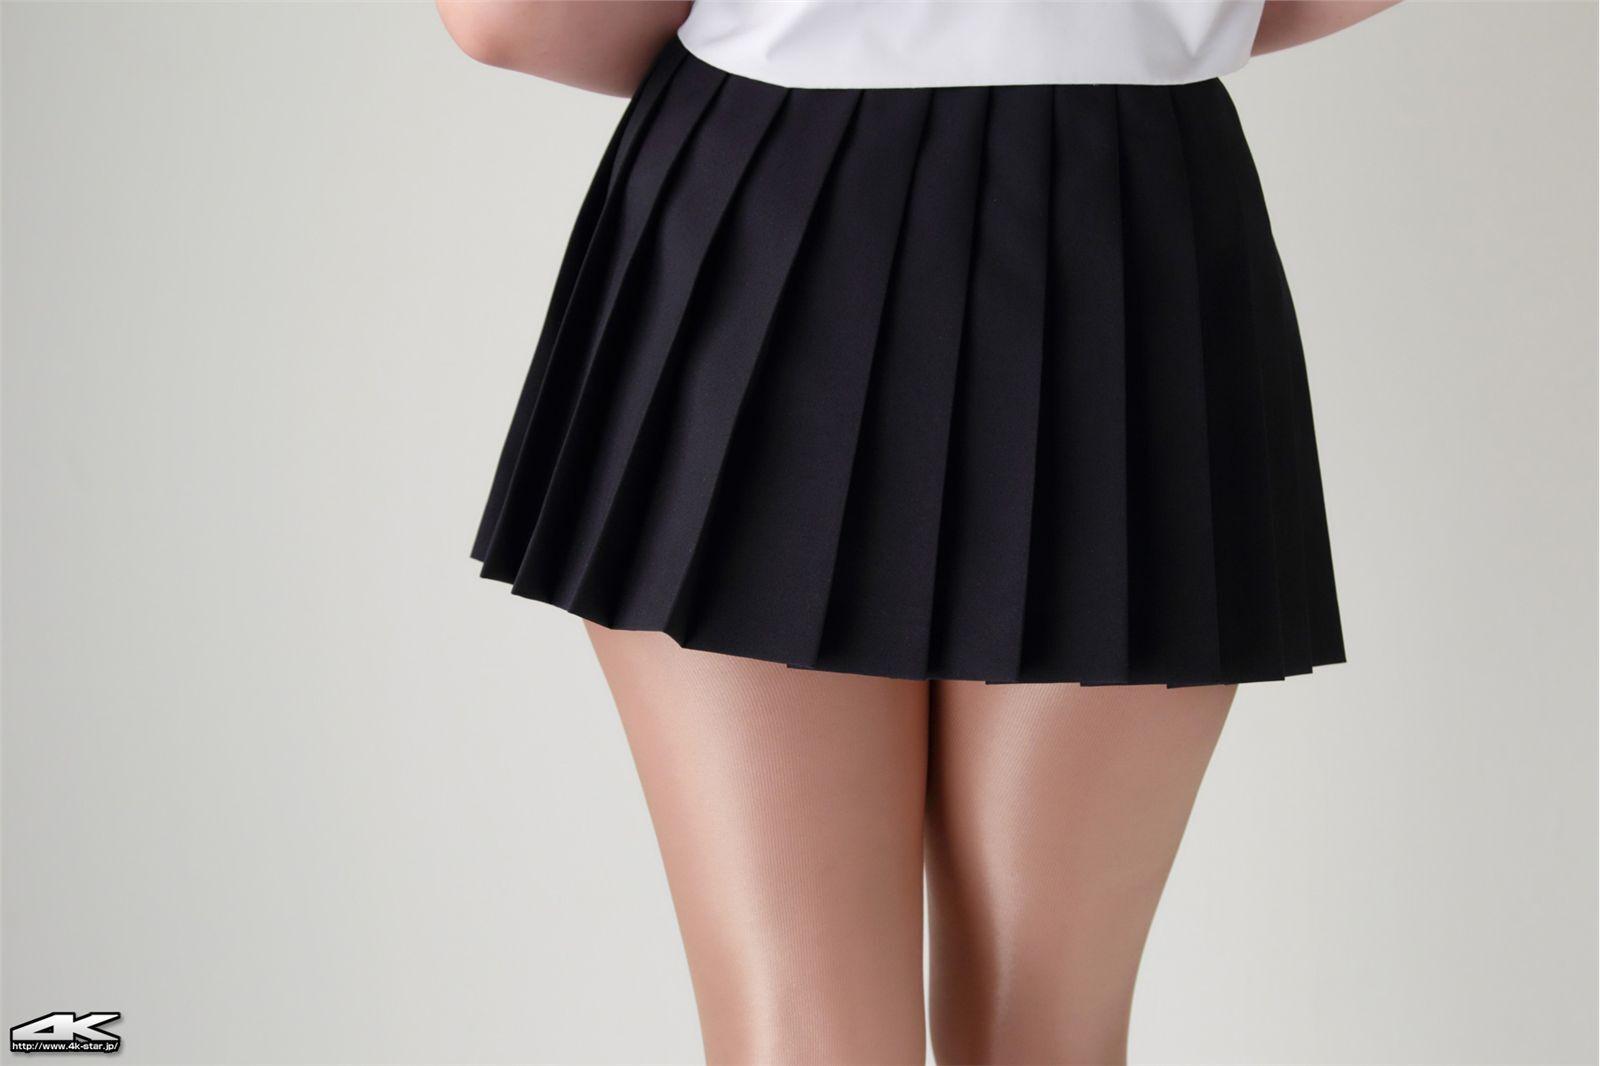 4k-star套图 日本性感美女 NO.00018 如月くるみ「セーラー服」